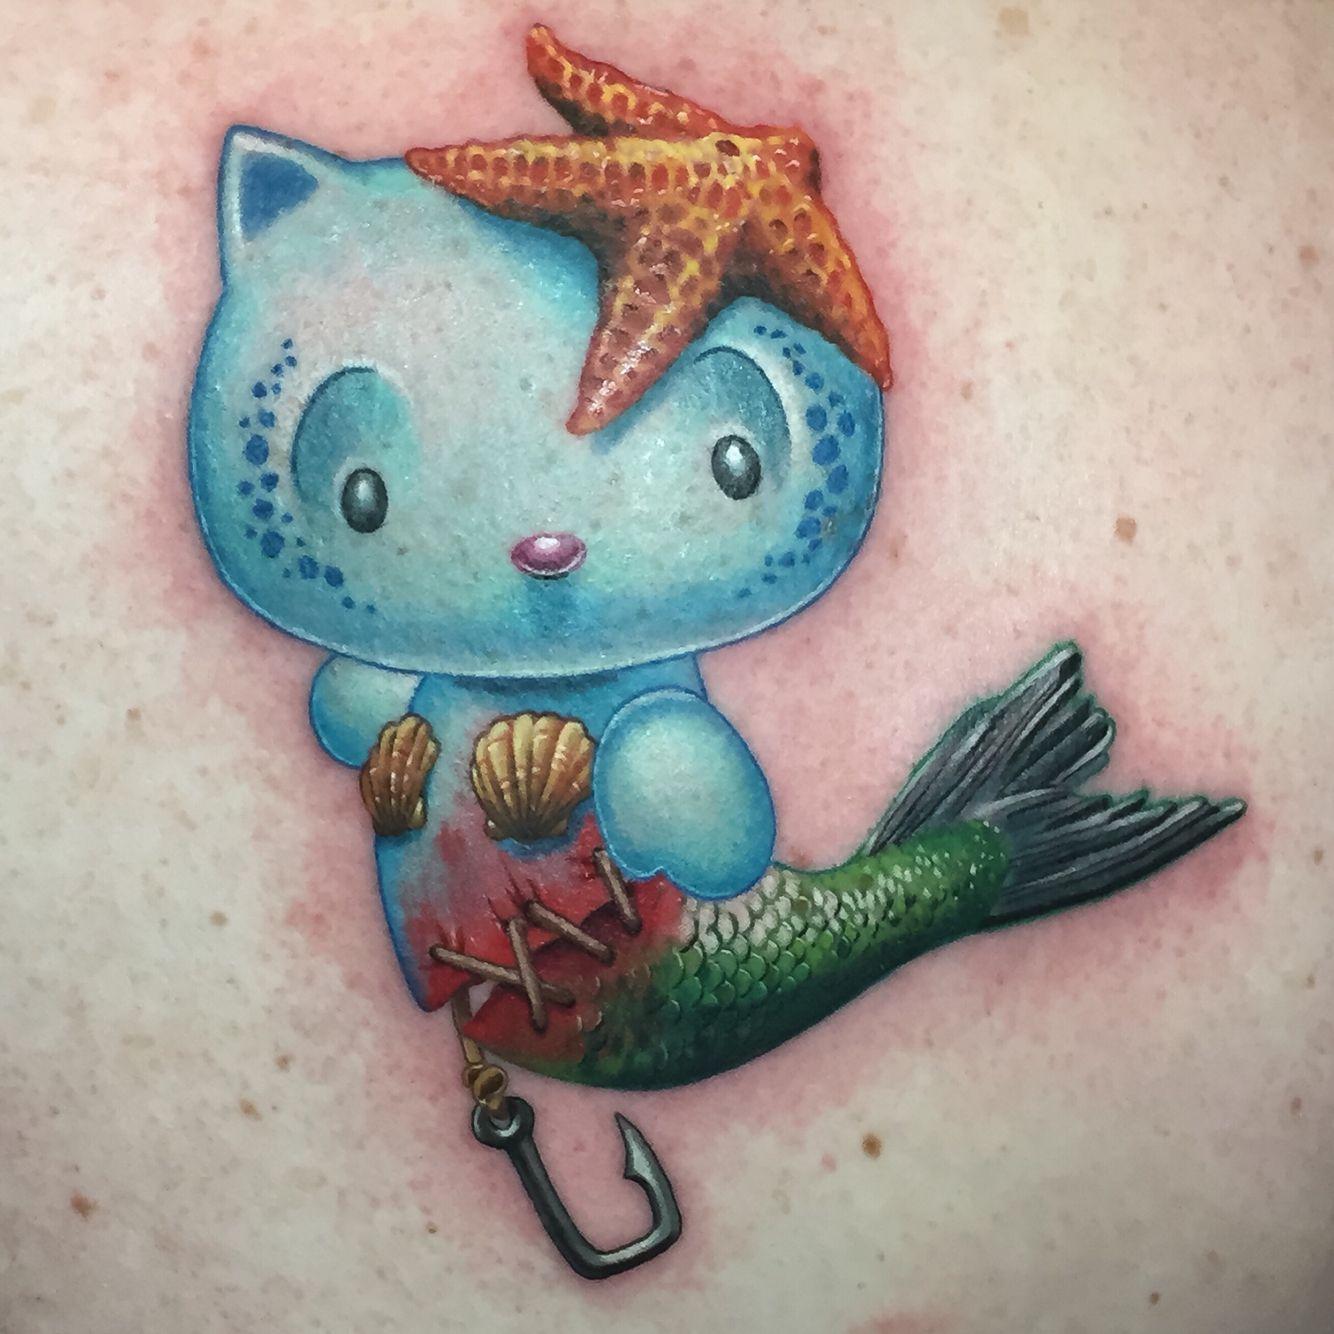 e758f343b My custom Mermaid Hello Kitty. Or, Mer-Kitty. #tattoo #tattoos #hellokitty  #cute #mermaid @tatu_chino